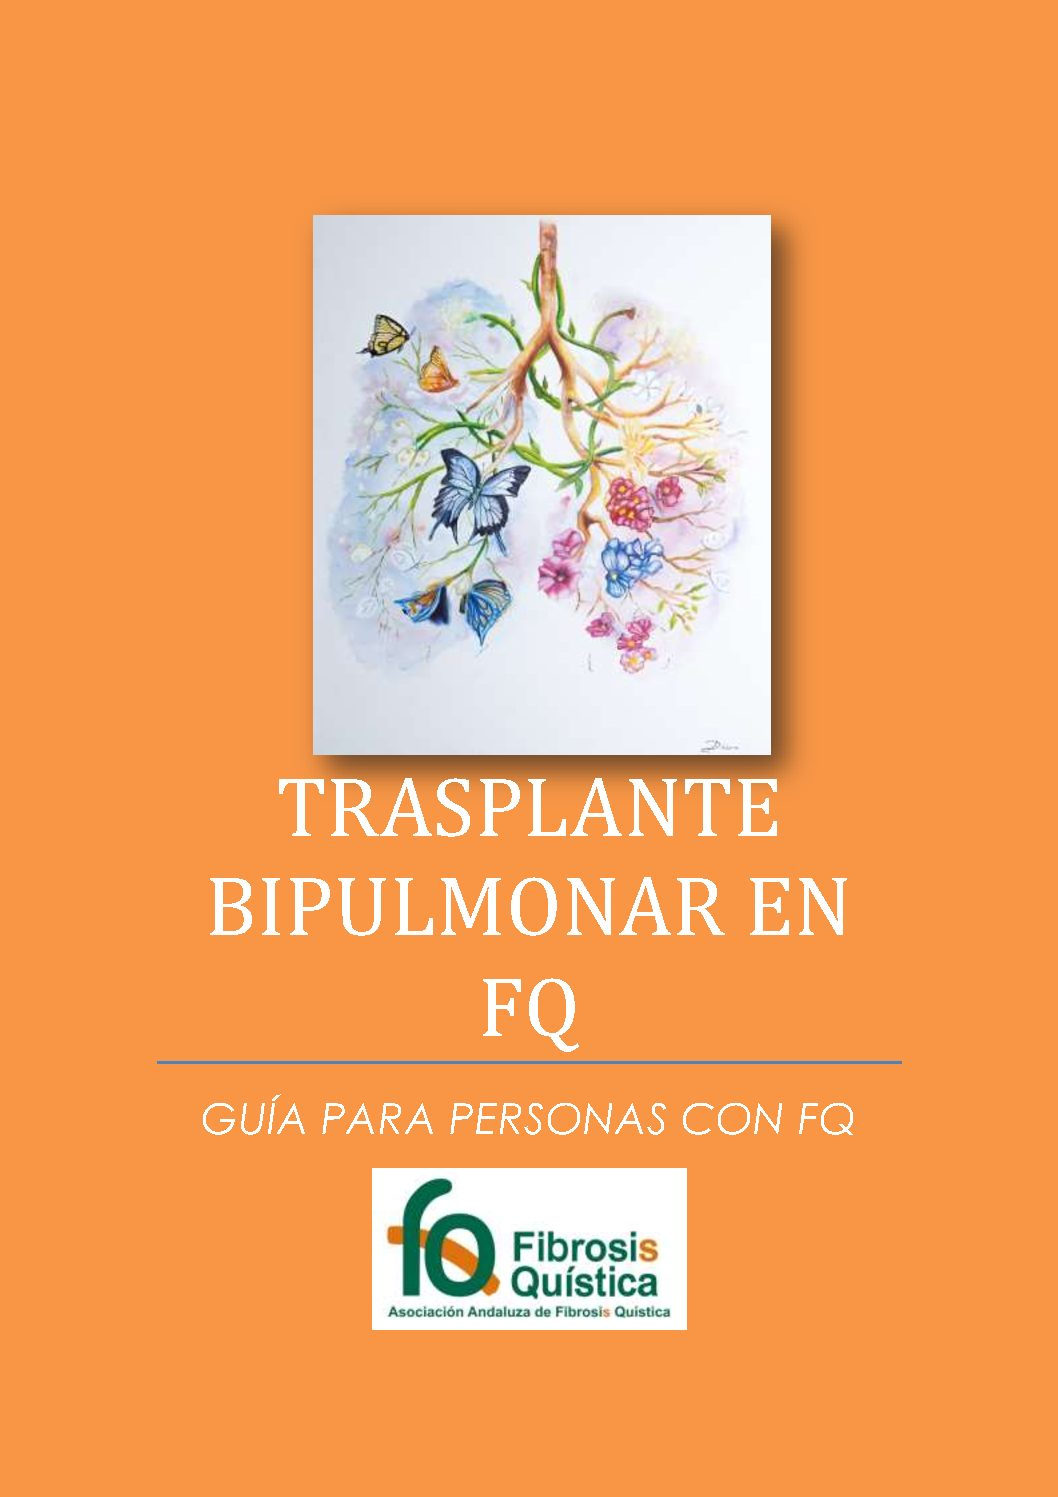 GUÍA DE TRASPLANTE BIPULMONAR EN FQ